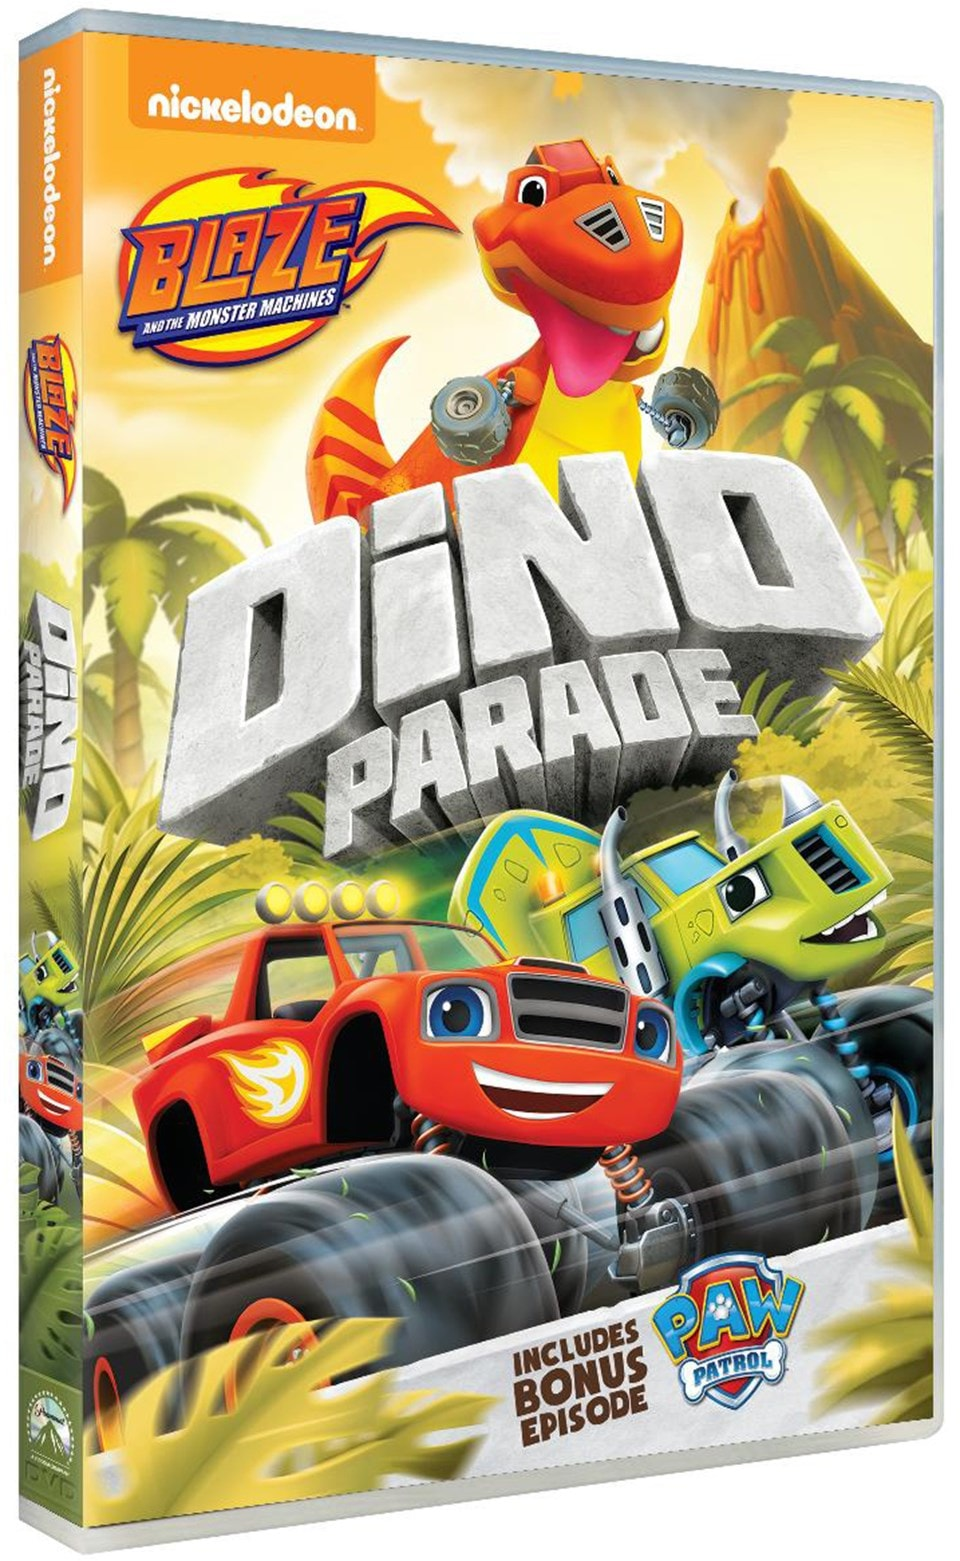 Blaze and the Monster Machines: Dino Parade - 2